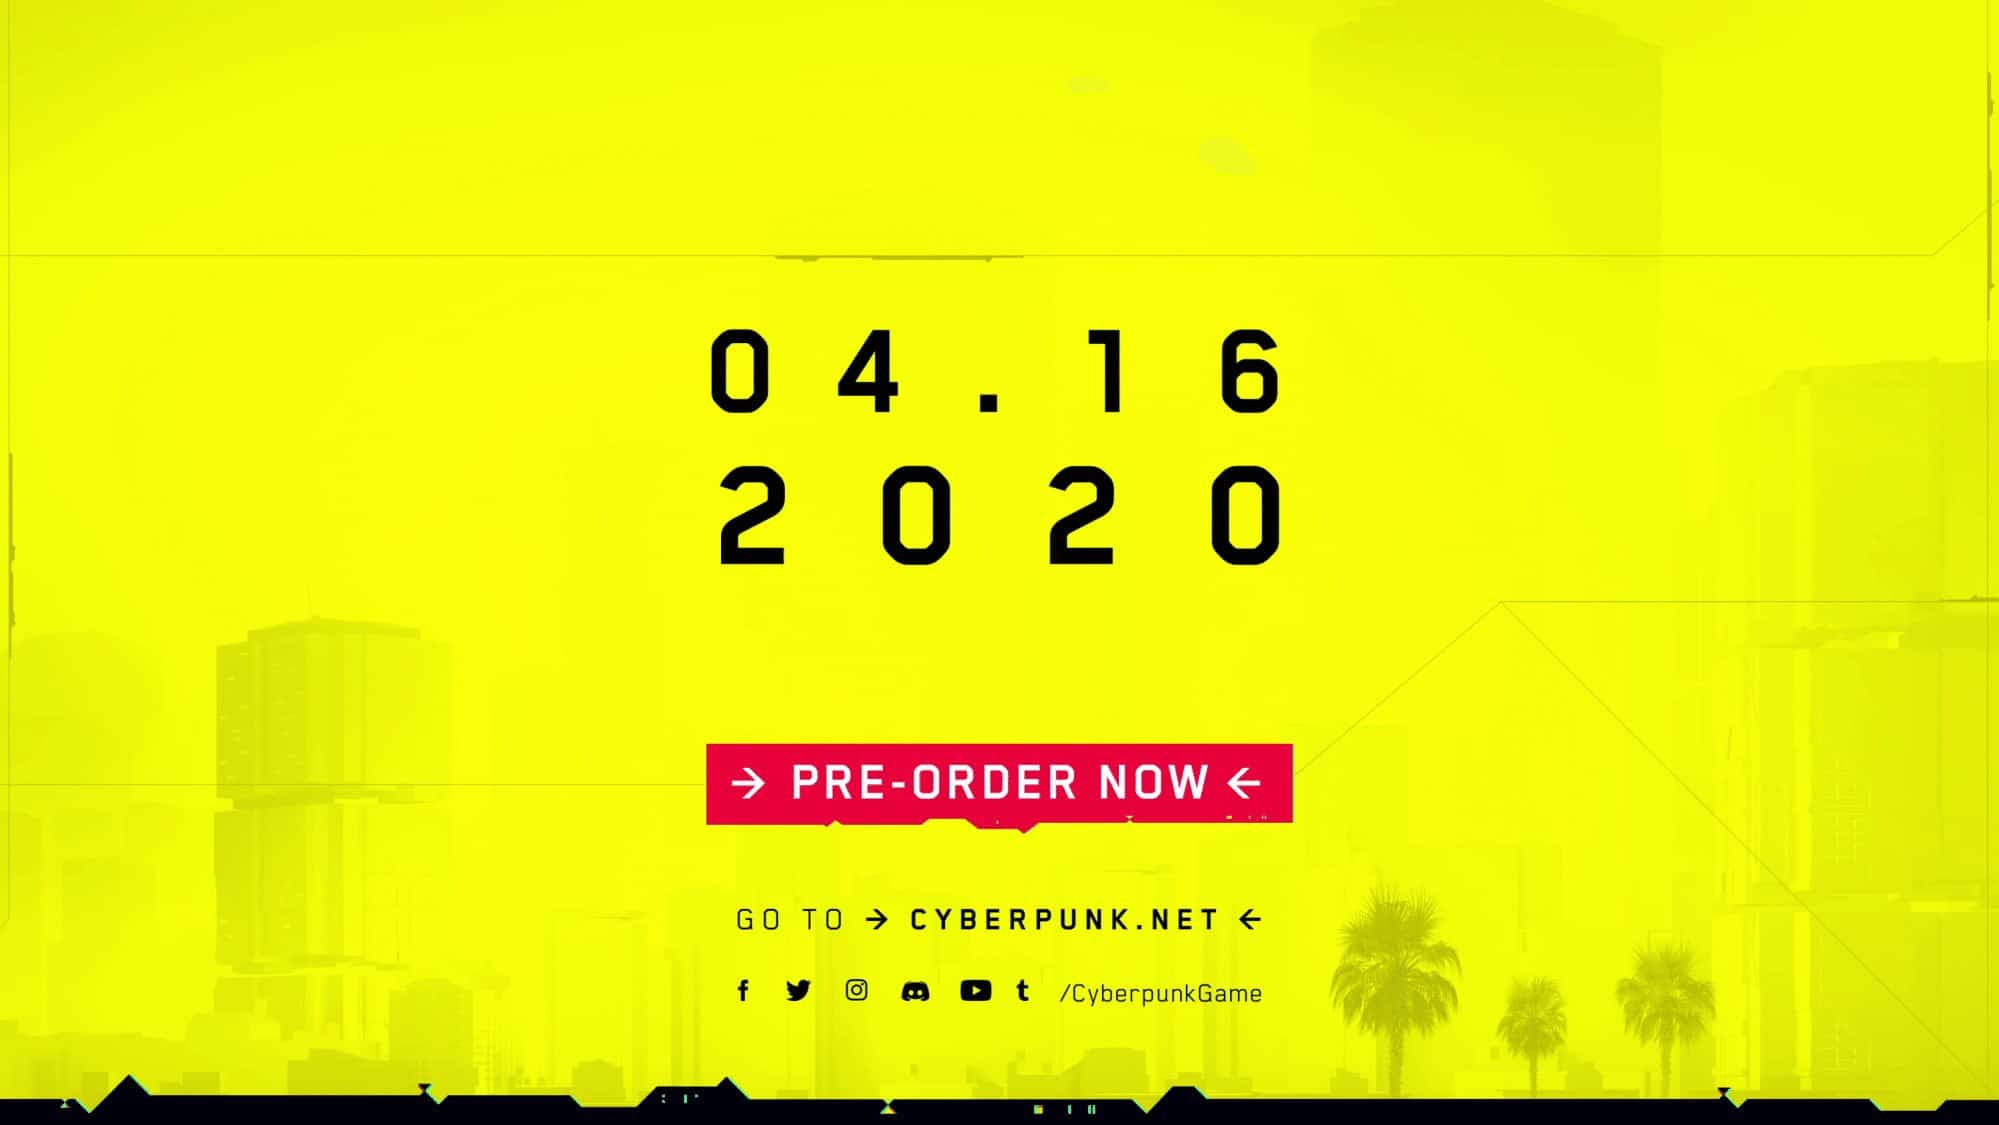 Cyberpunk 2077 เปิด pre-order แล้ววันนี้ มาพร้อมกับภาษาไทย 2